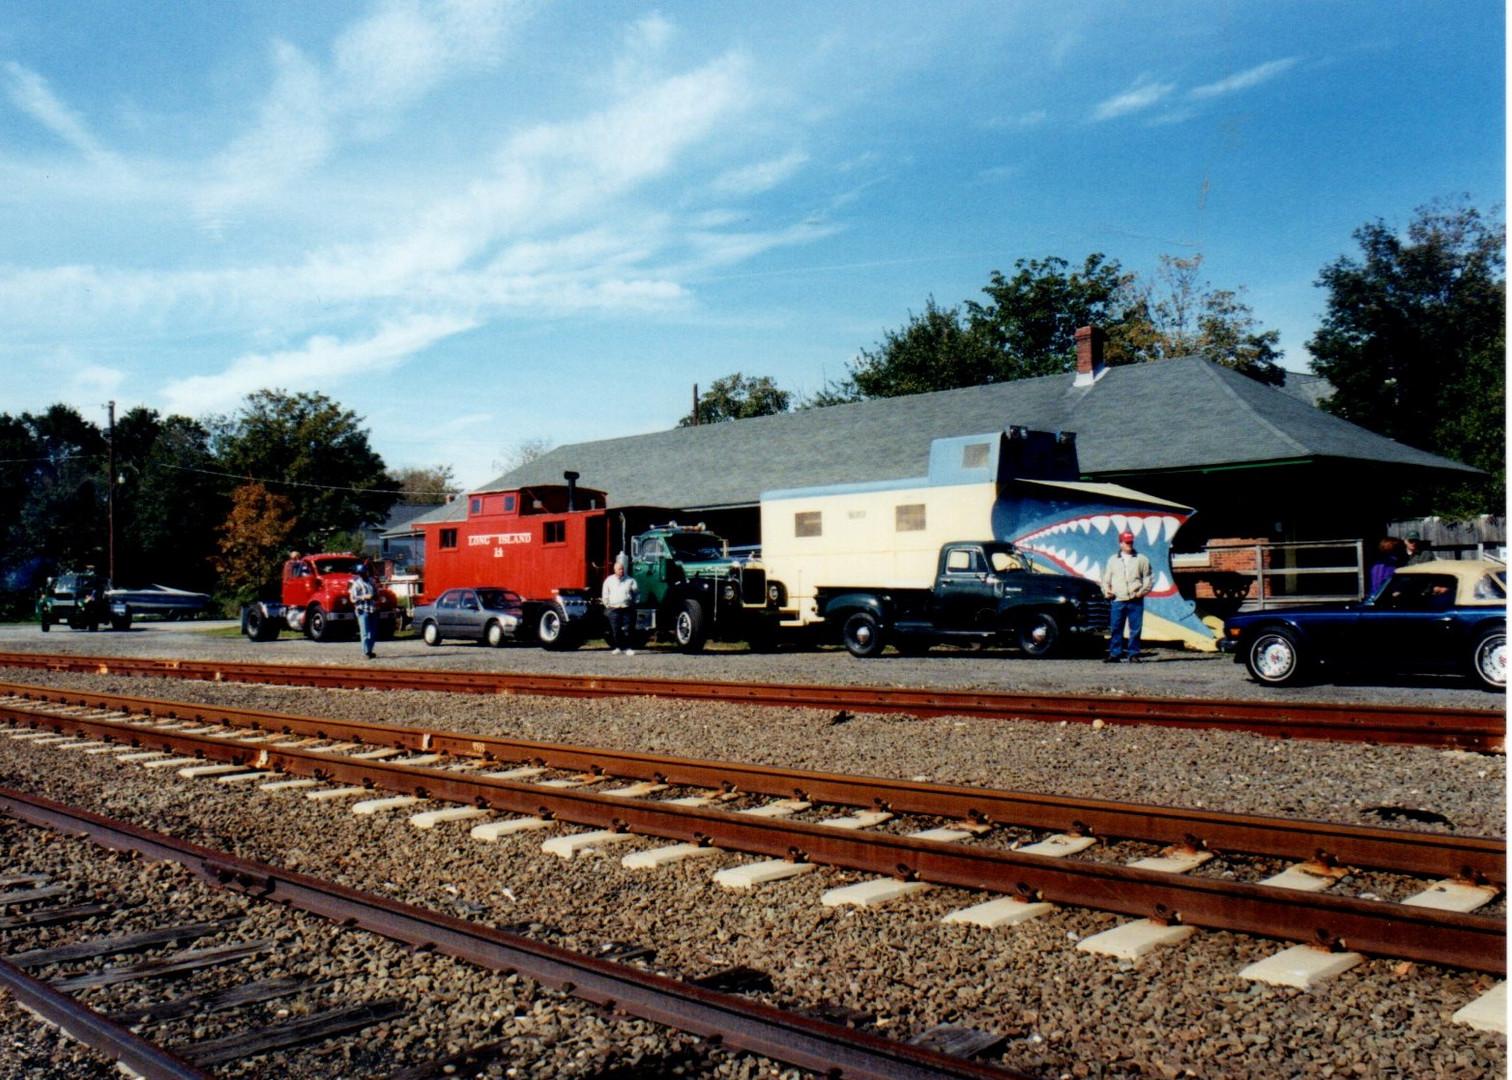 Final stop - Long Island Railroad Museun in Greenport